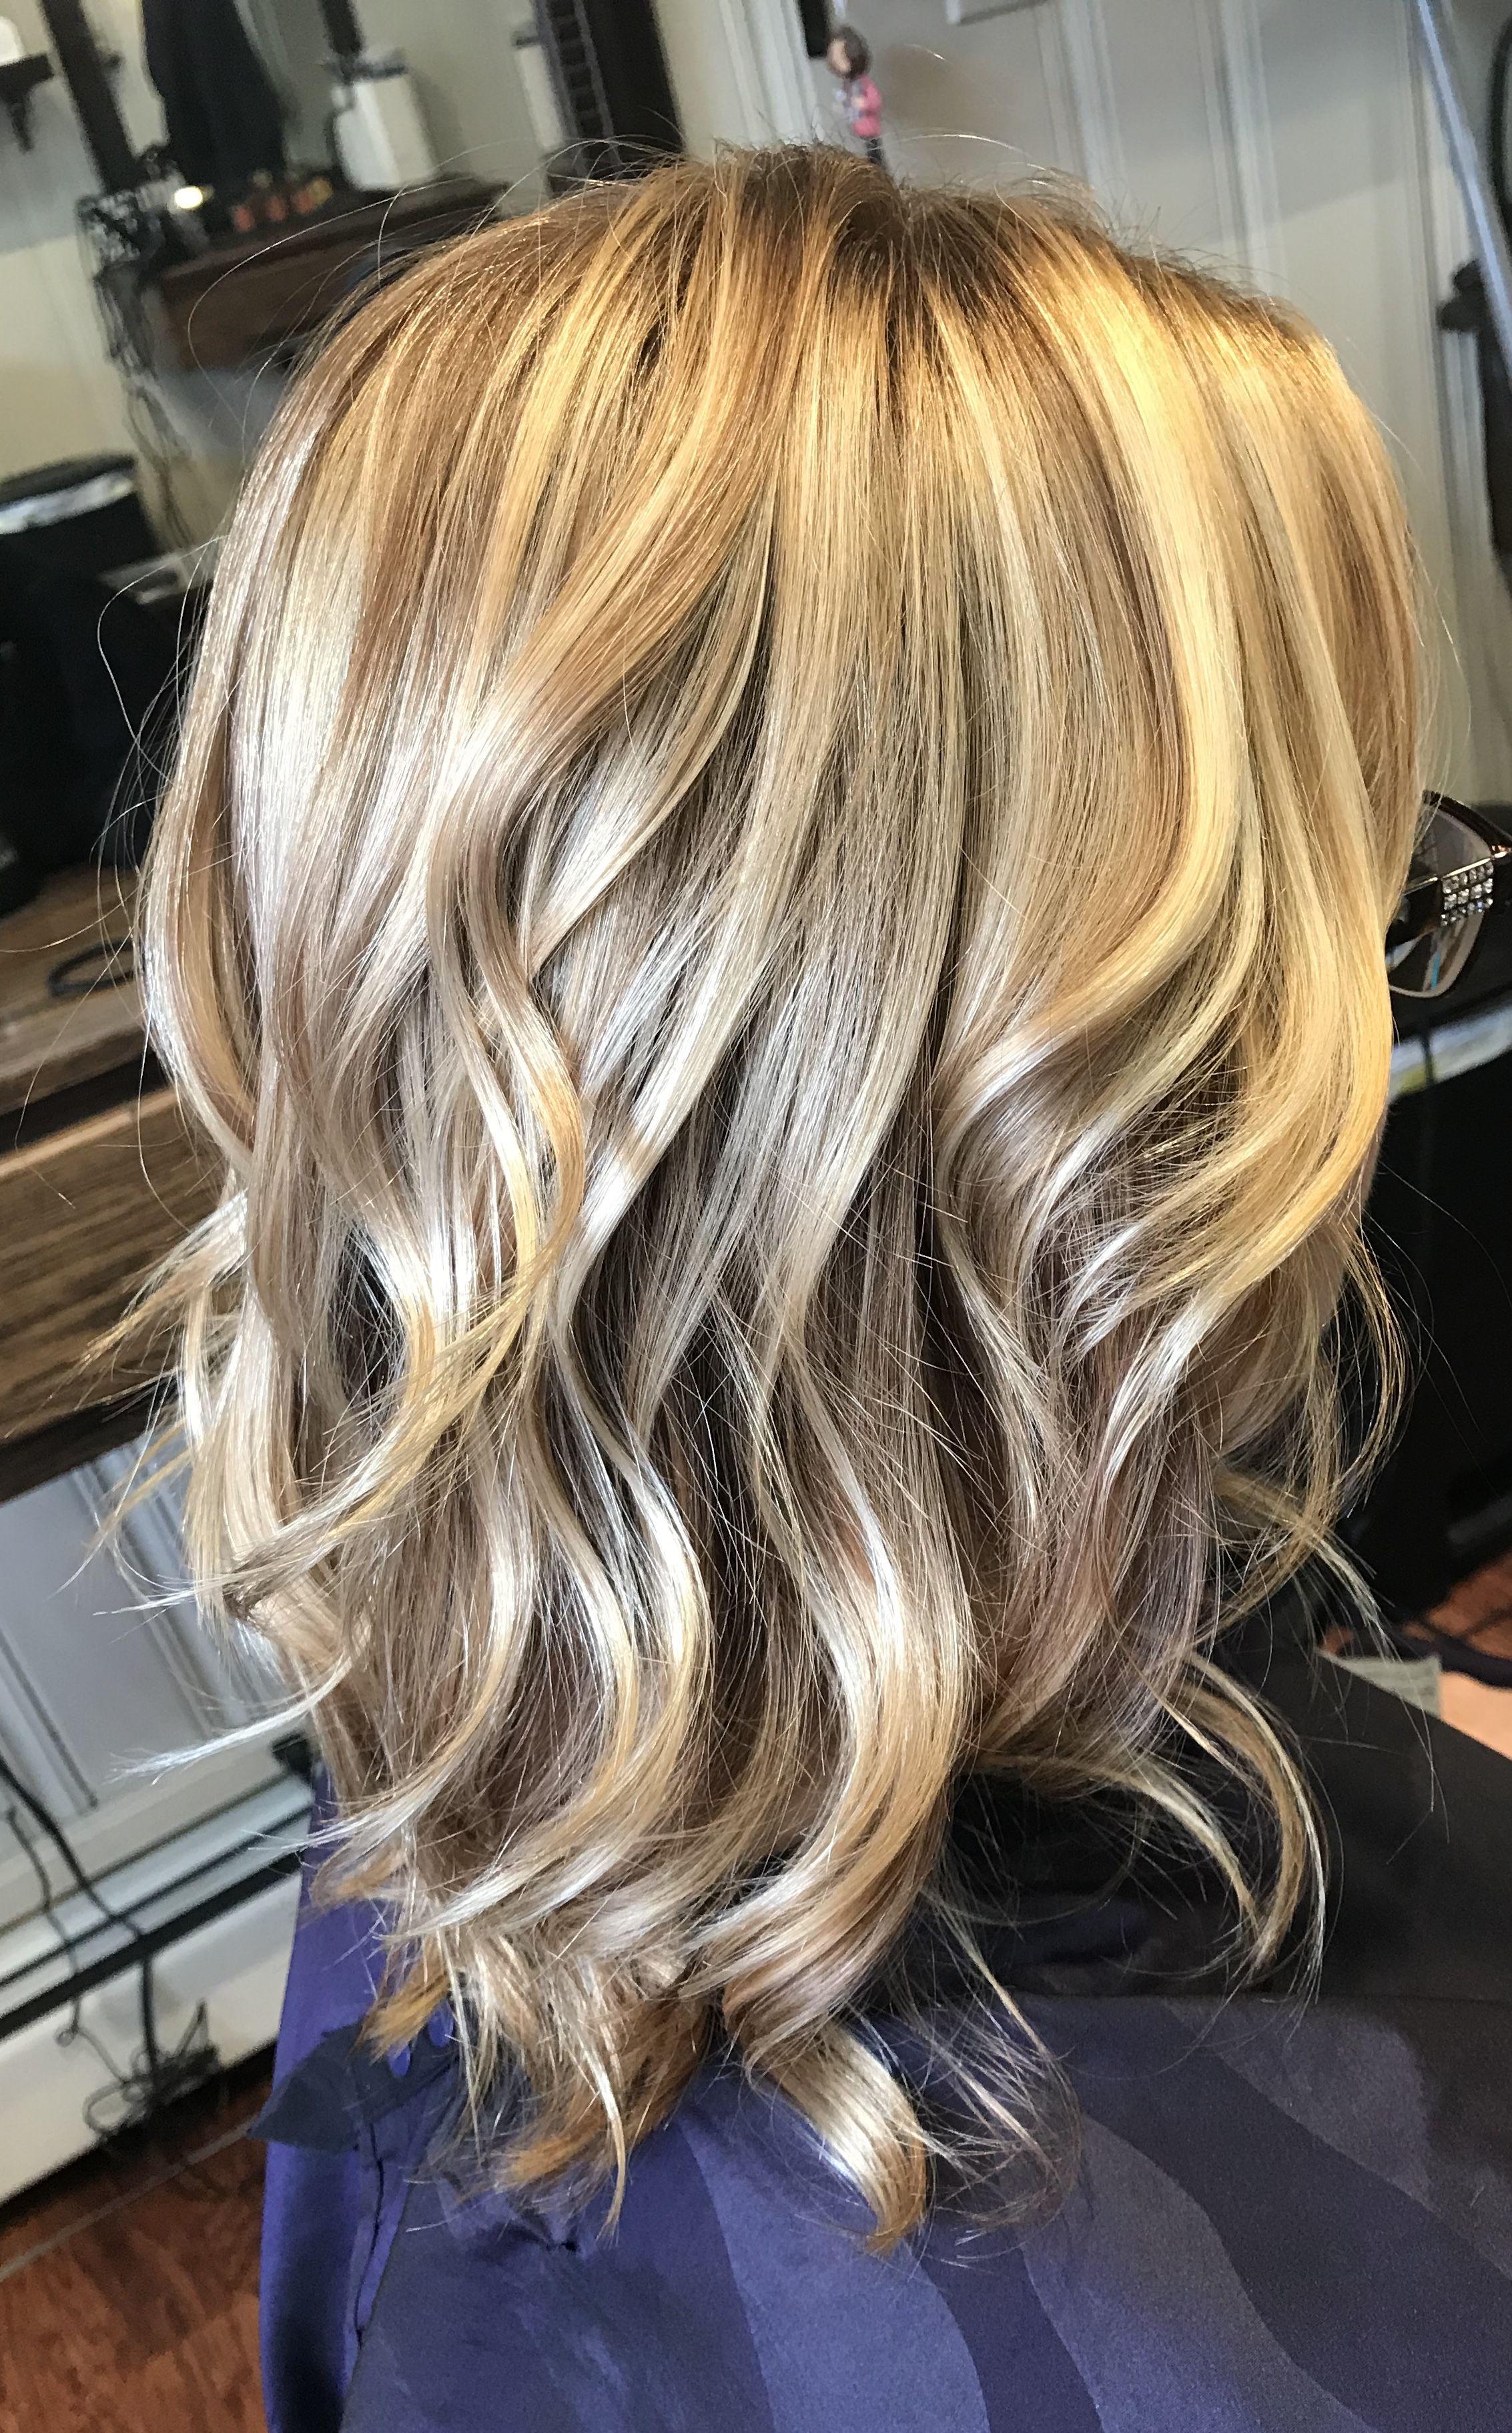 Bright Blonde Highlights On Dark Blonde Hair Color Short Hair Pictures Short Wavy Hair Hair Styles